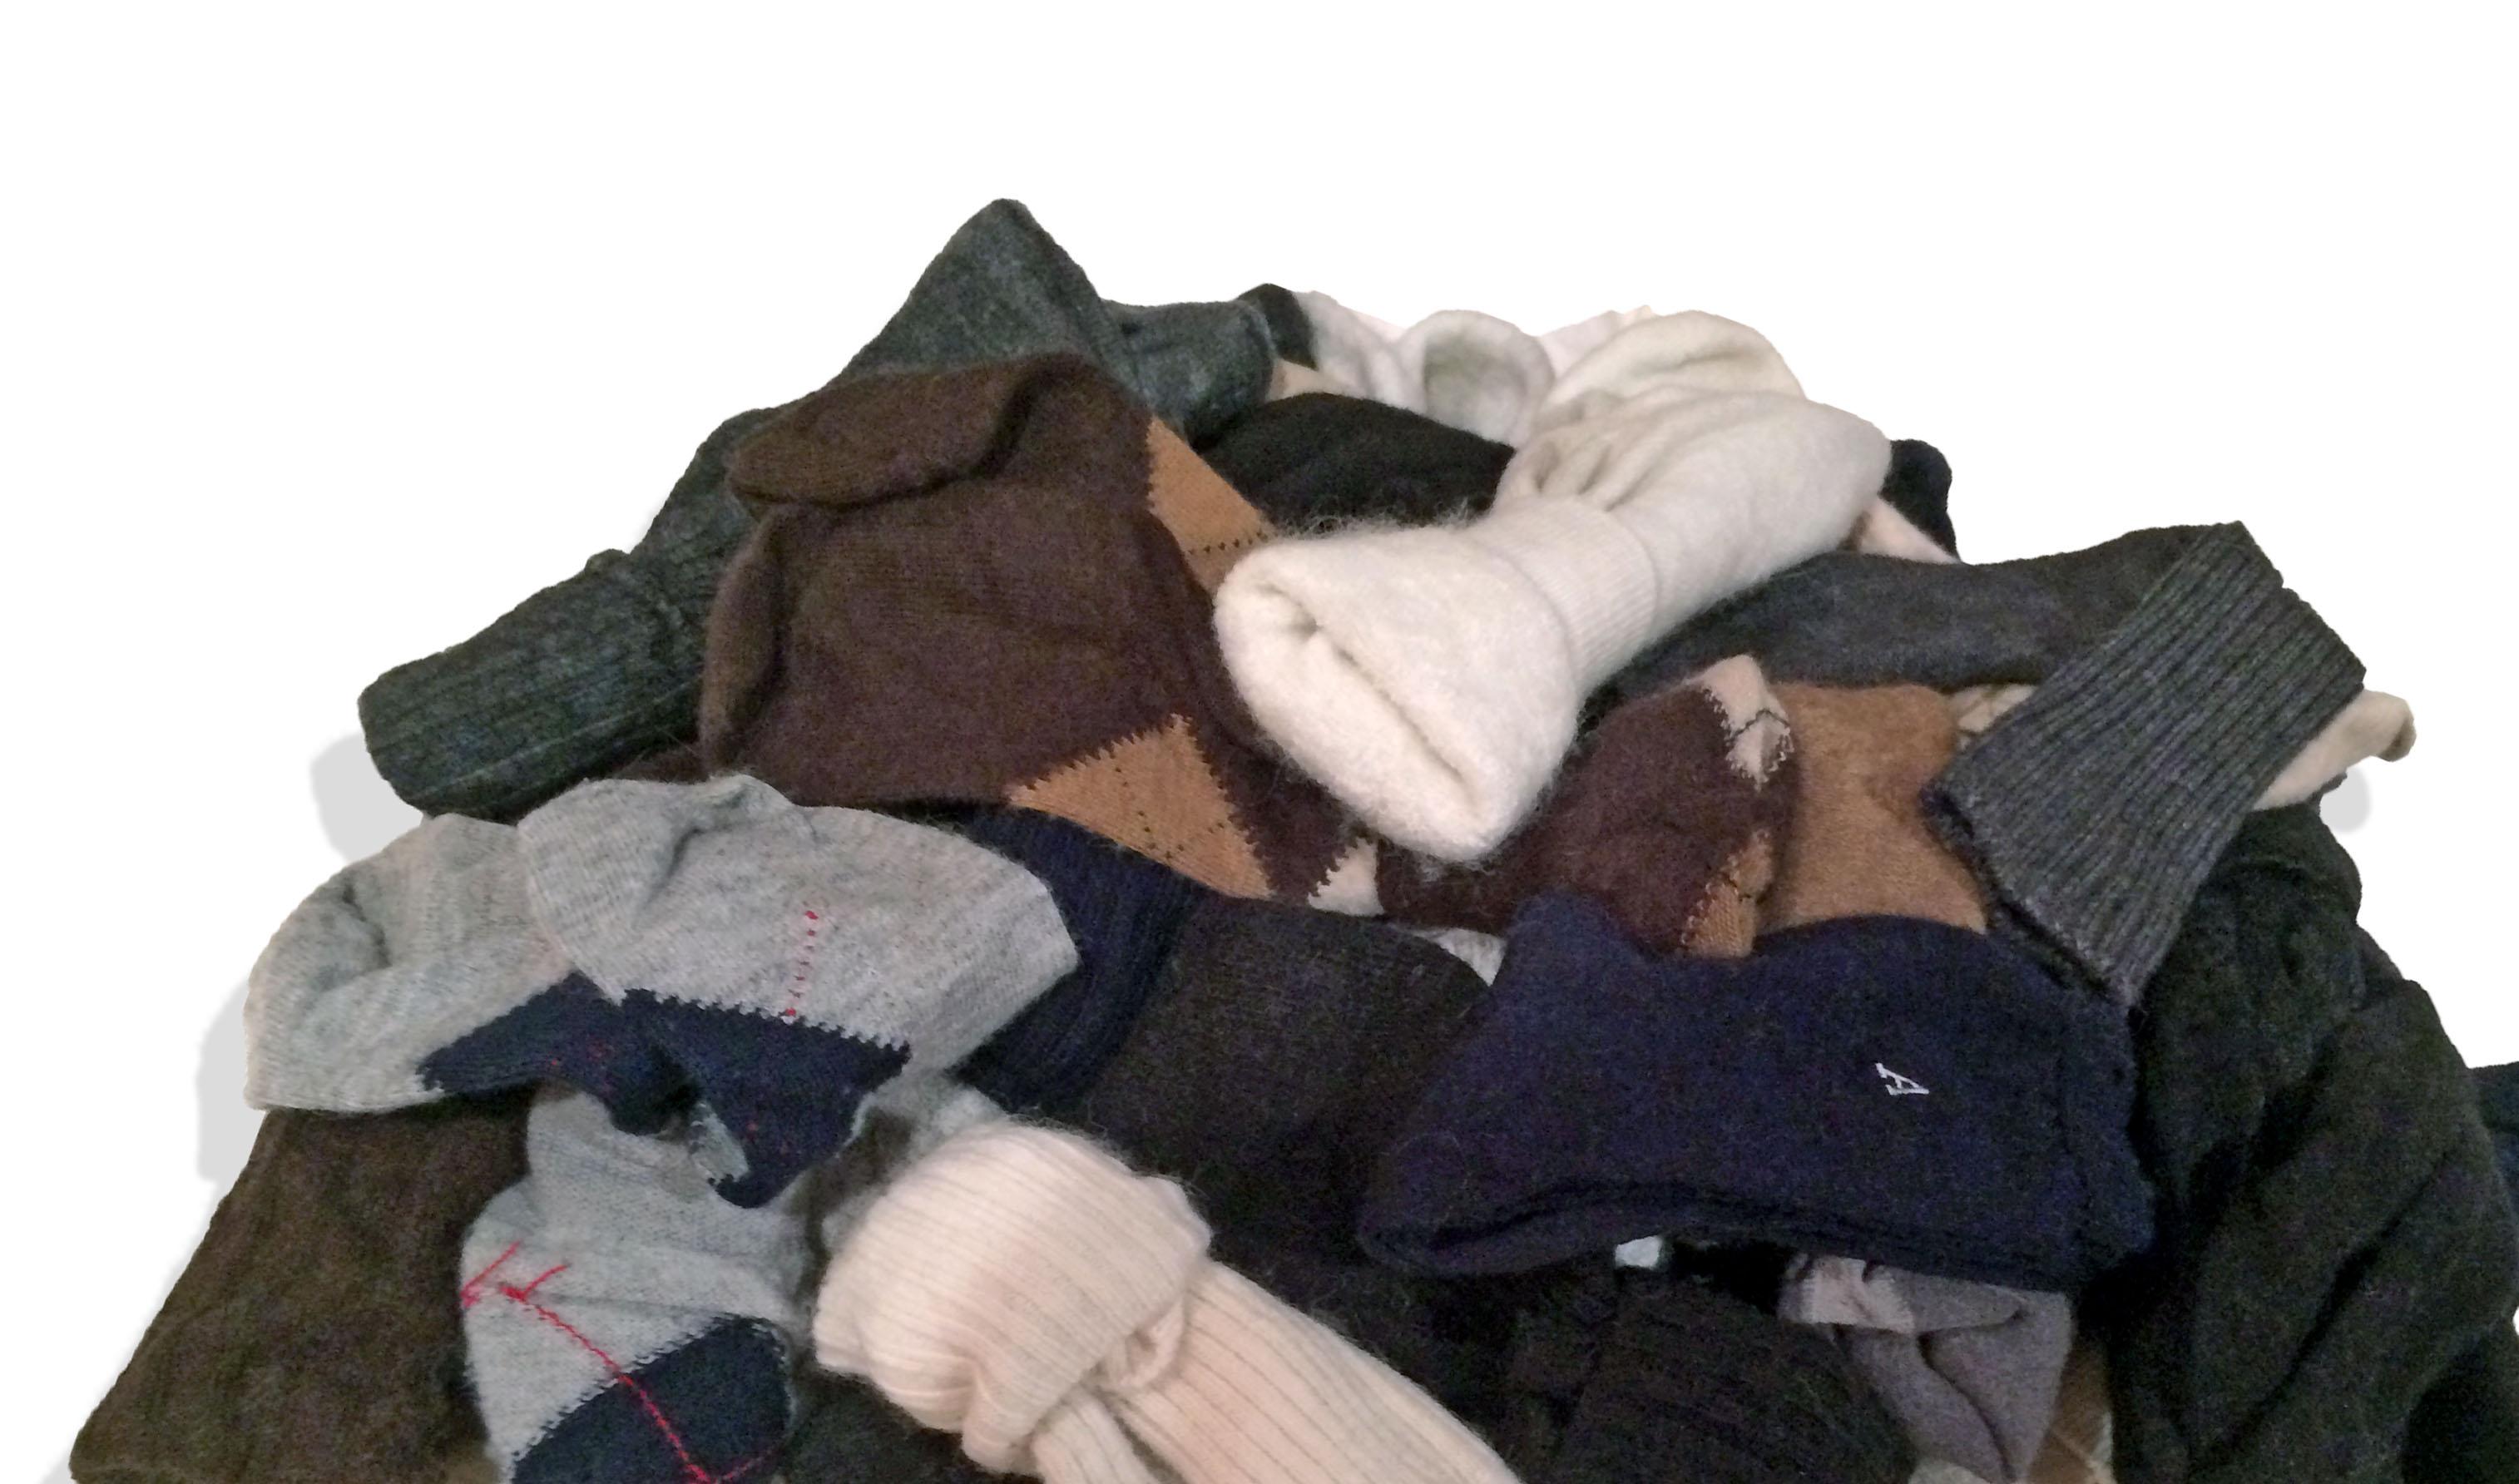 giant pile of socks - photo #1